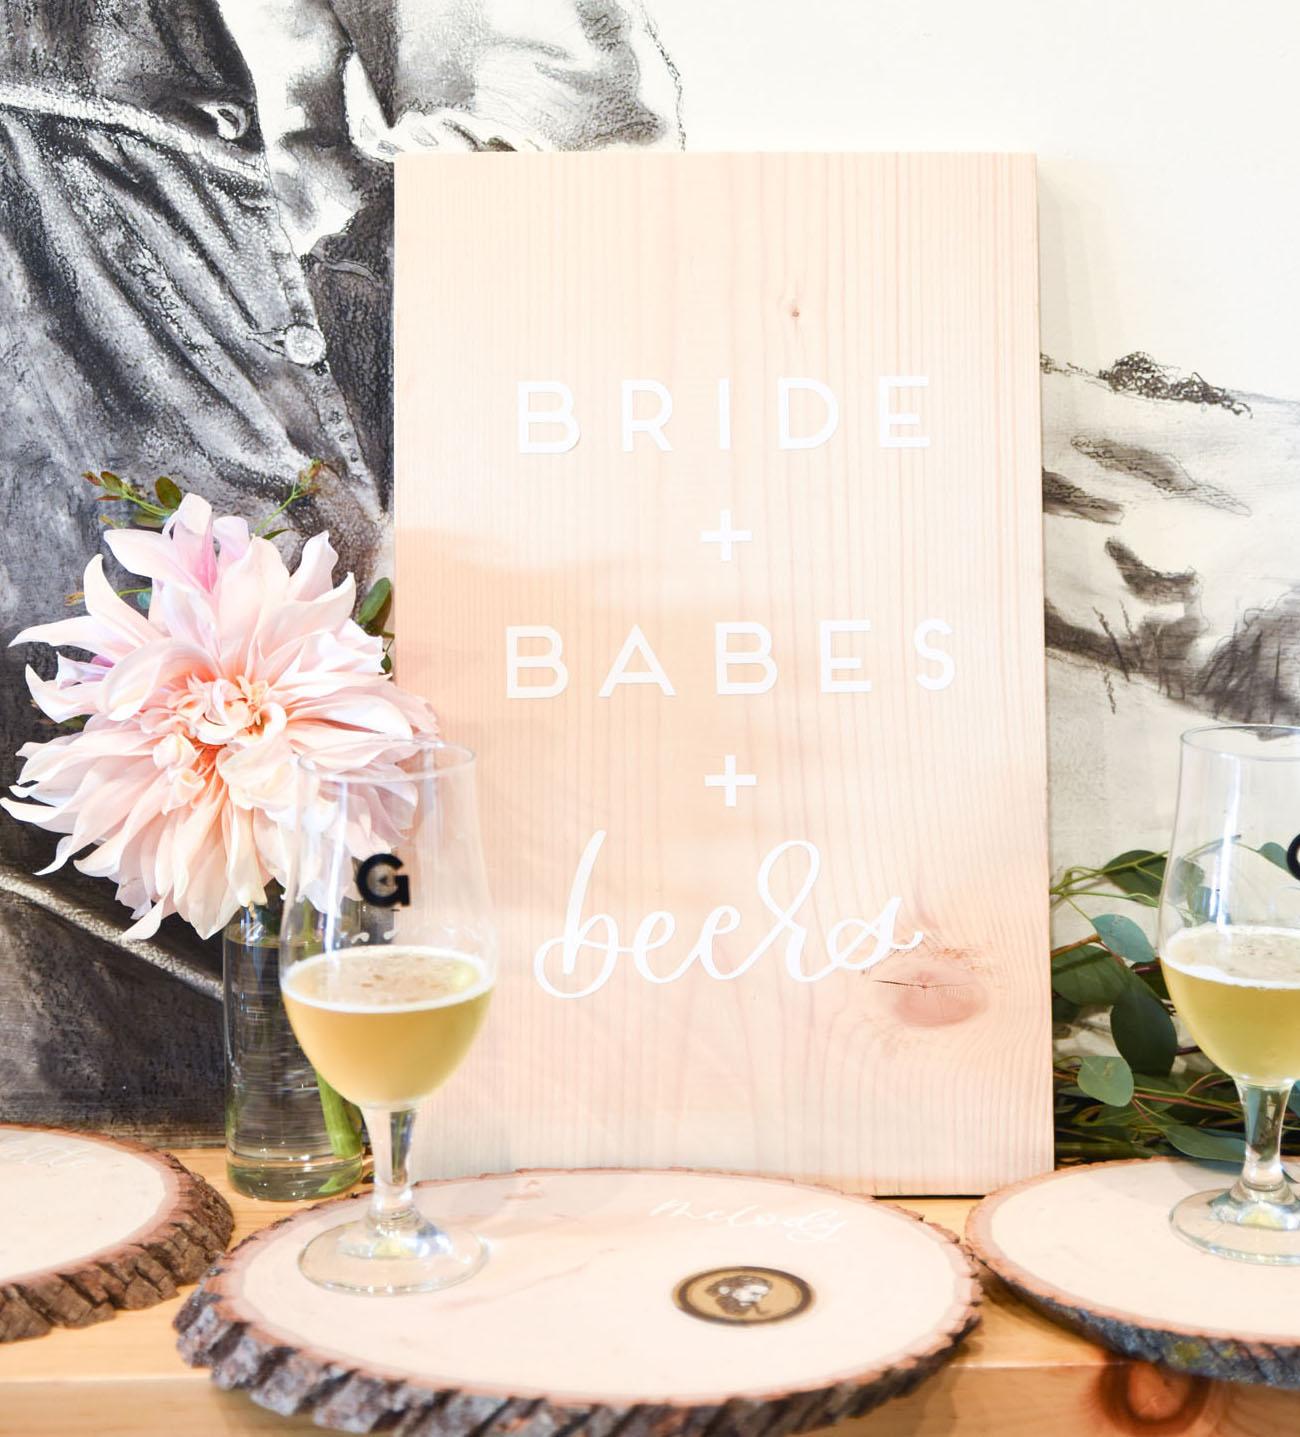 0c8008a09d0 Bride + Babes + Beers  A Craft Beer Tasting Bridal Shower - Green ...